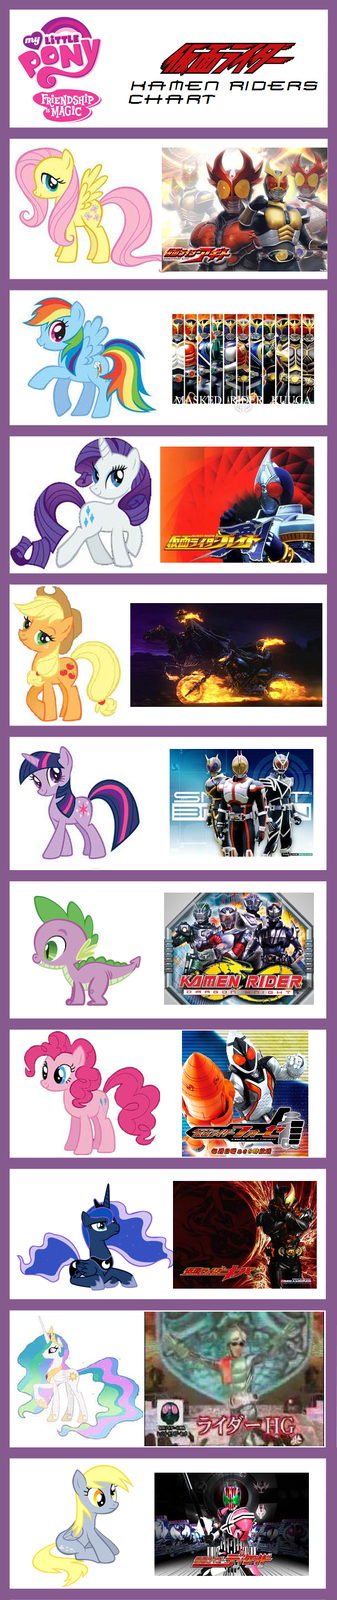 Pony Comparison Chart: Kamen Rider edition